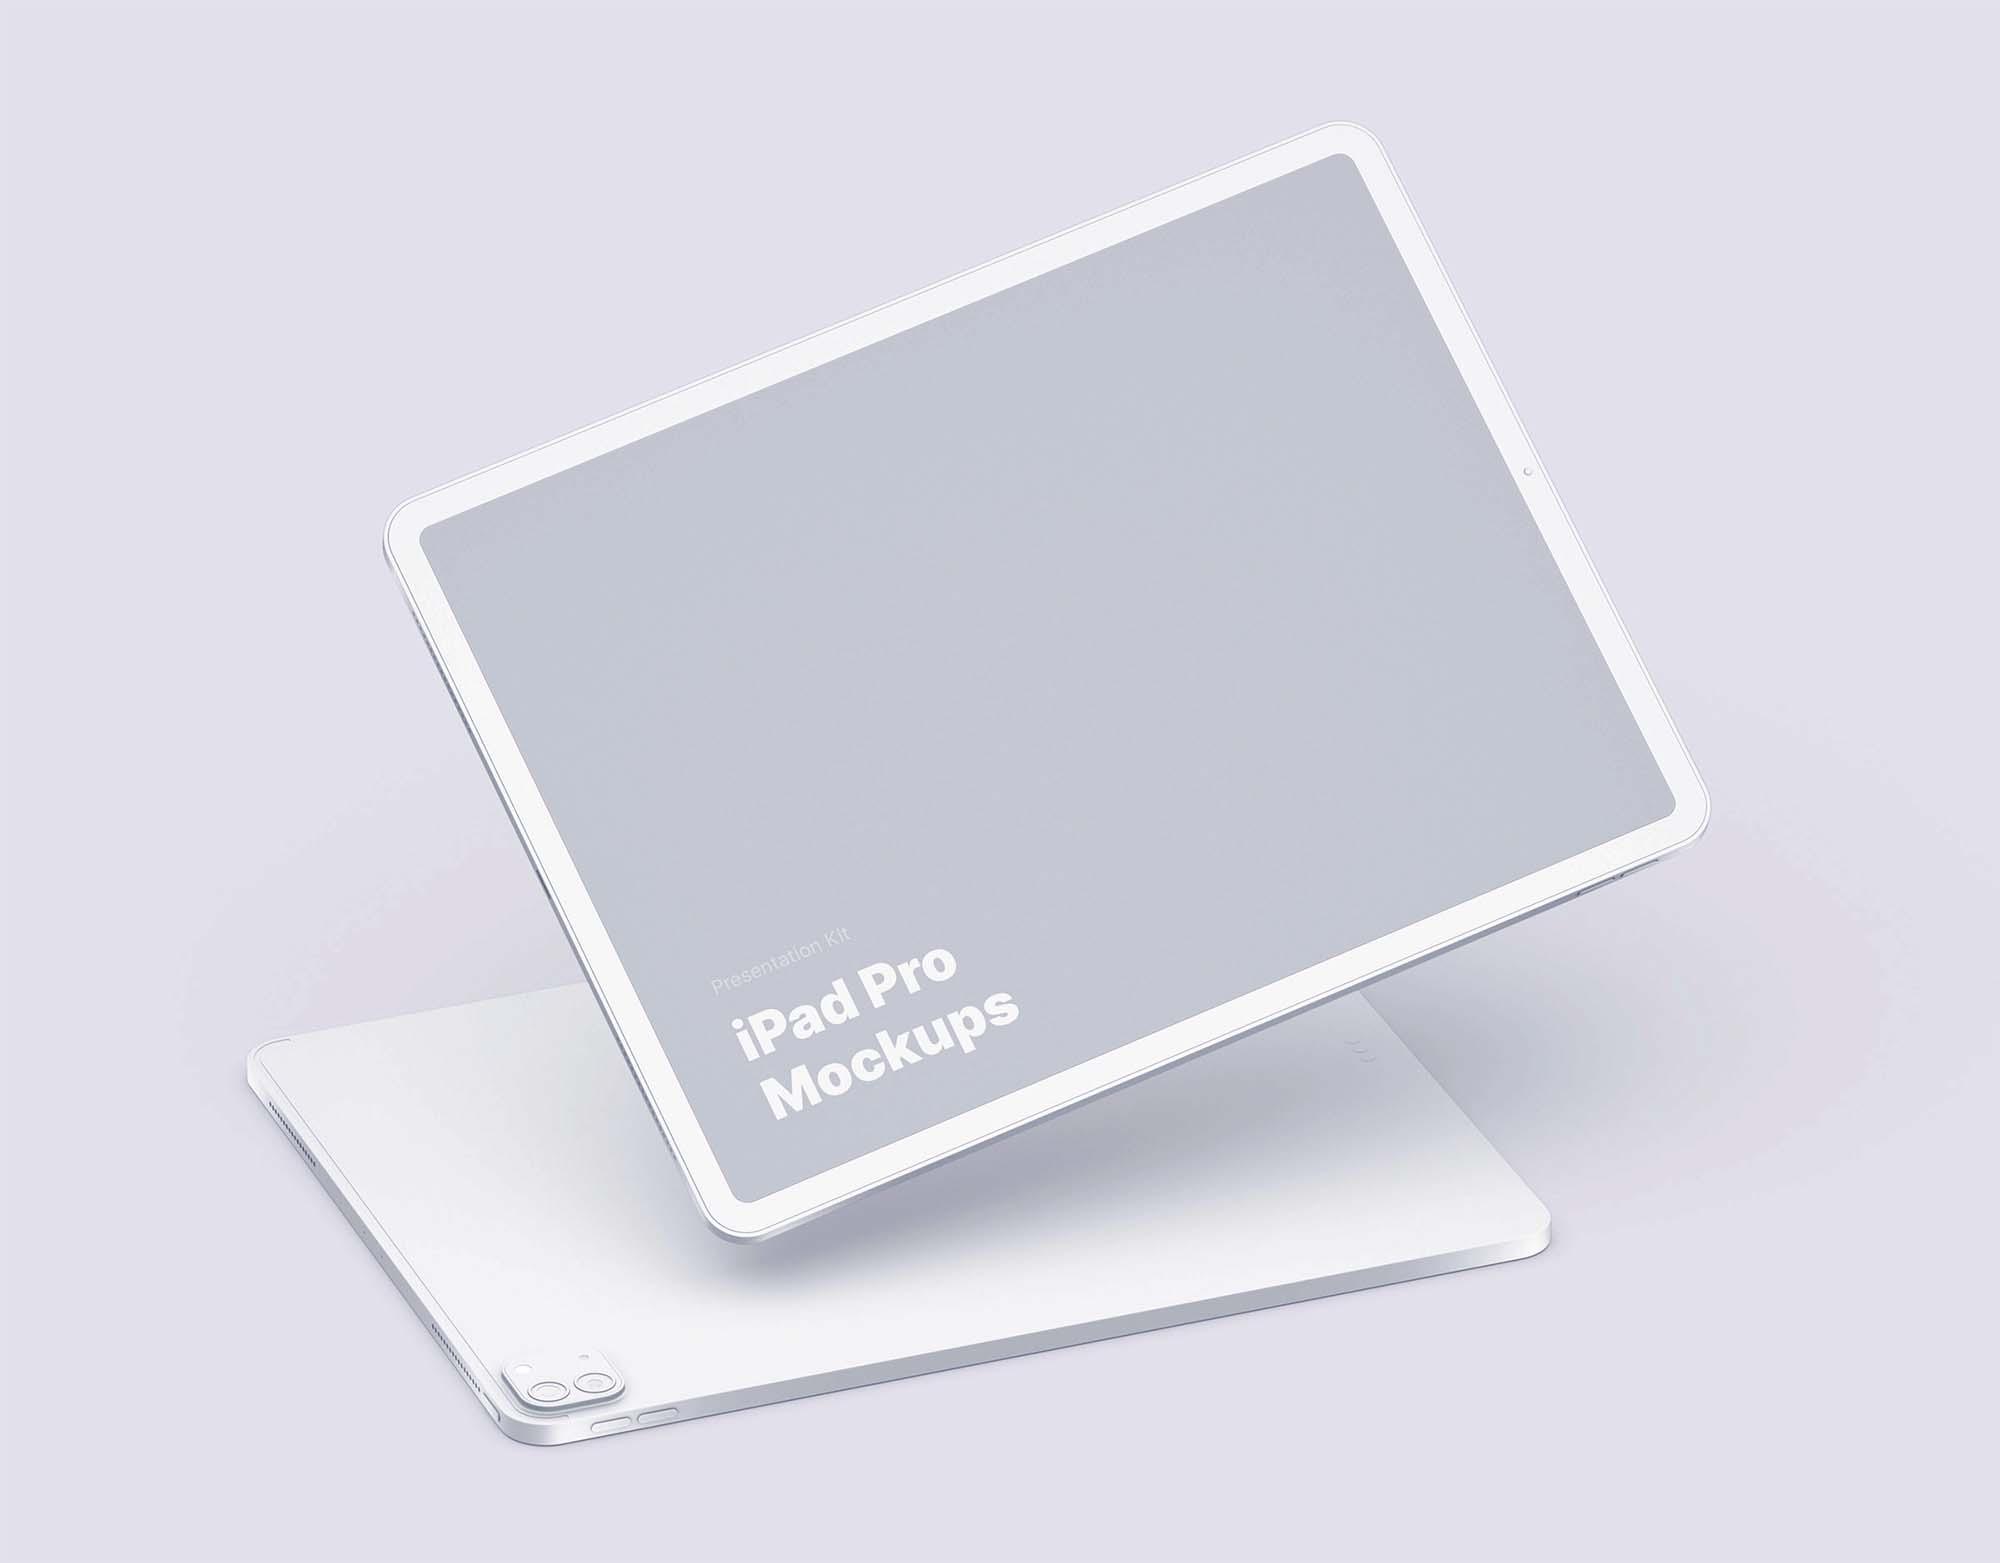 Clay iPad Pro Mockup 1